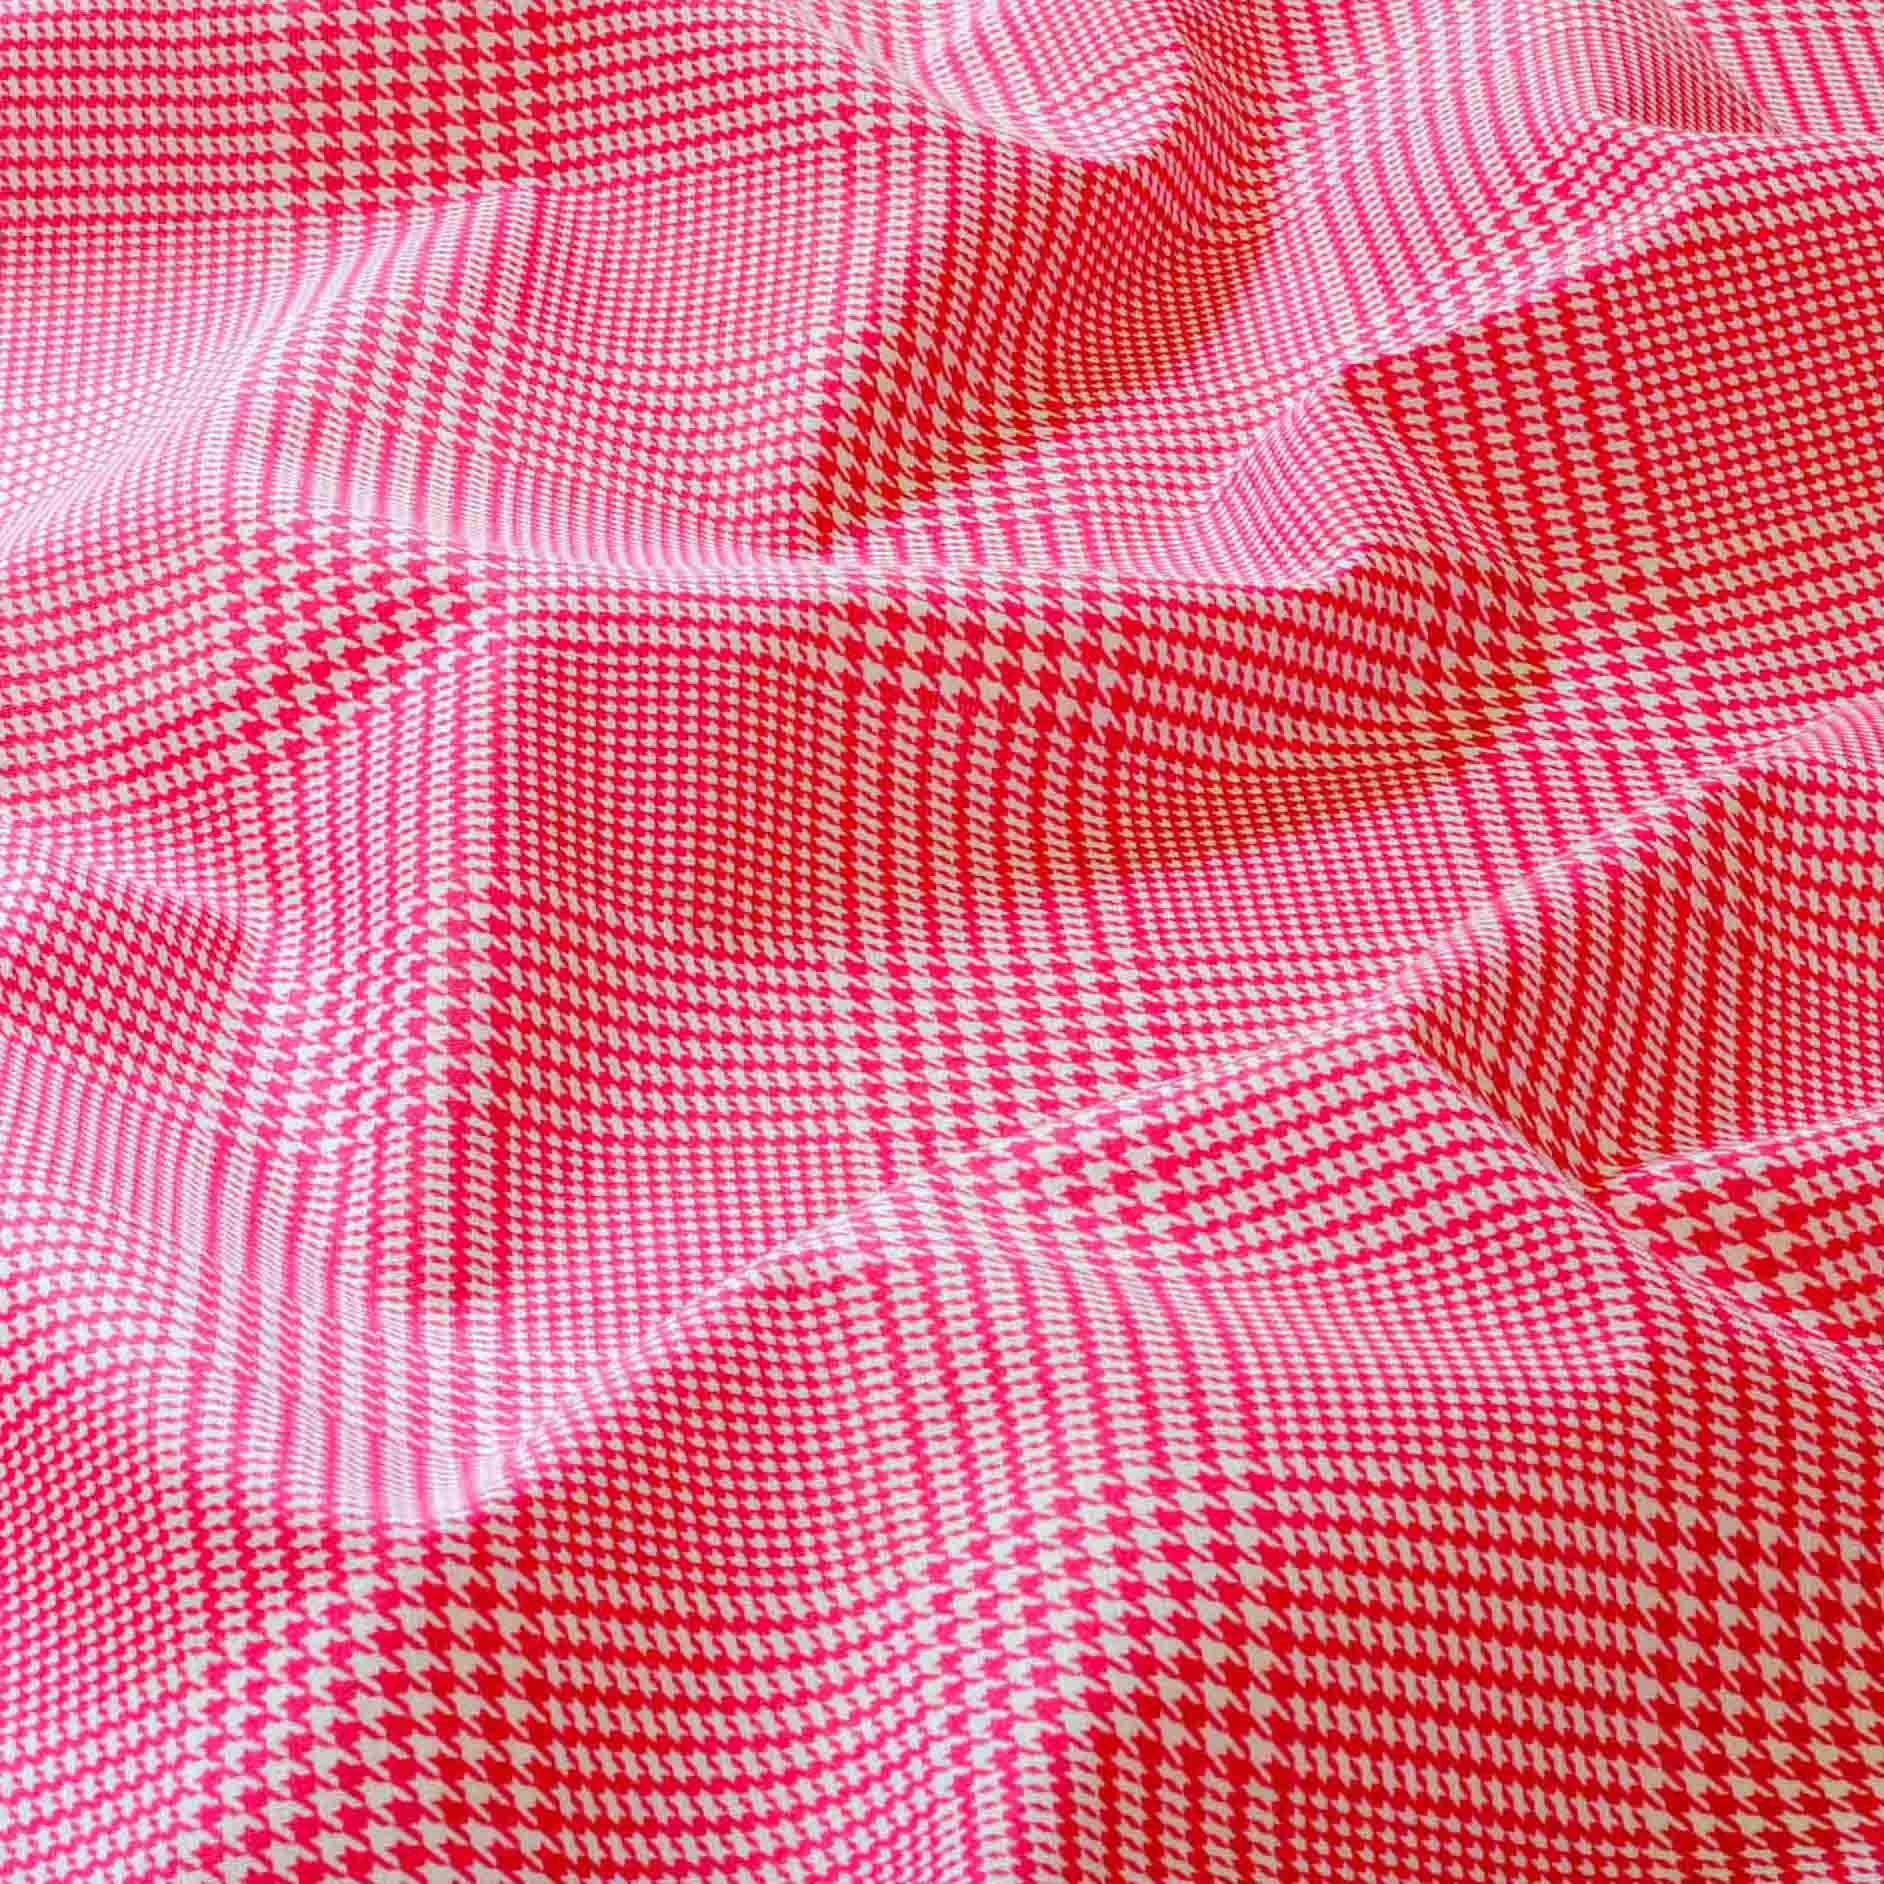 Tecido Tricoline Misto Estampado Xadrez Rosa 50% Algodao 50% Poliester 1,40 m Largura